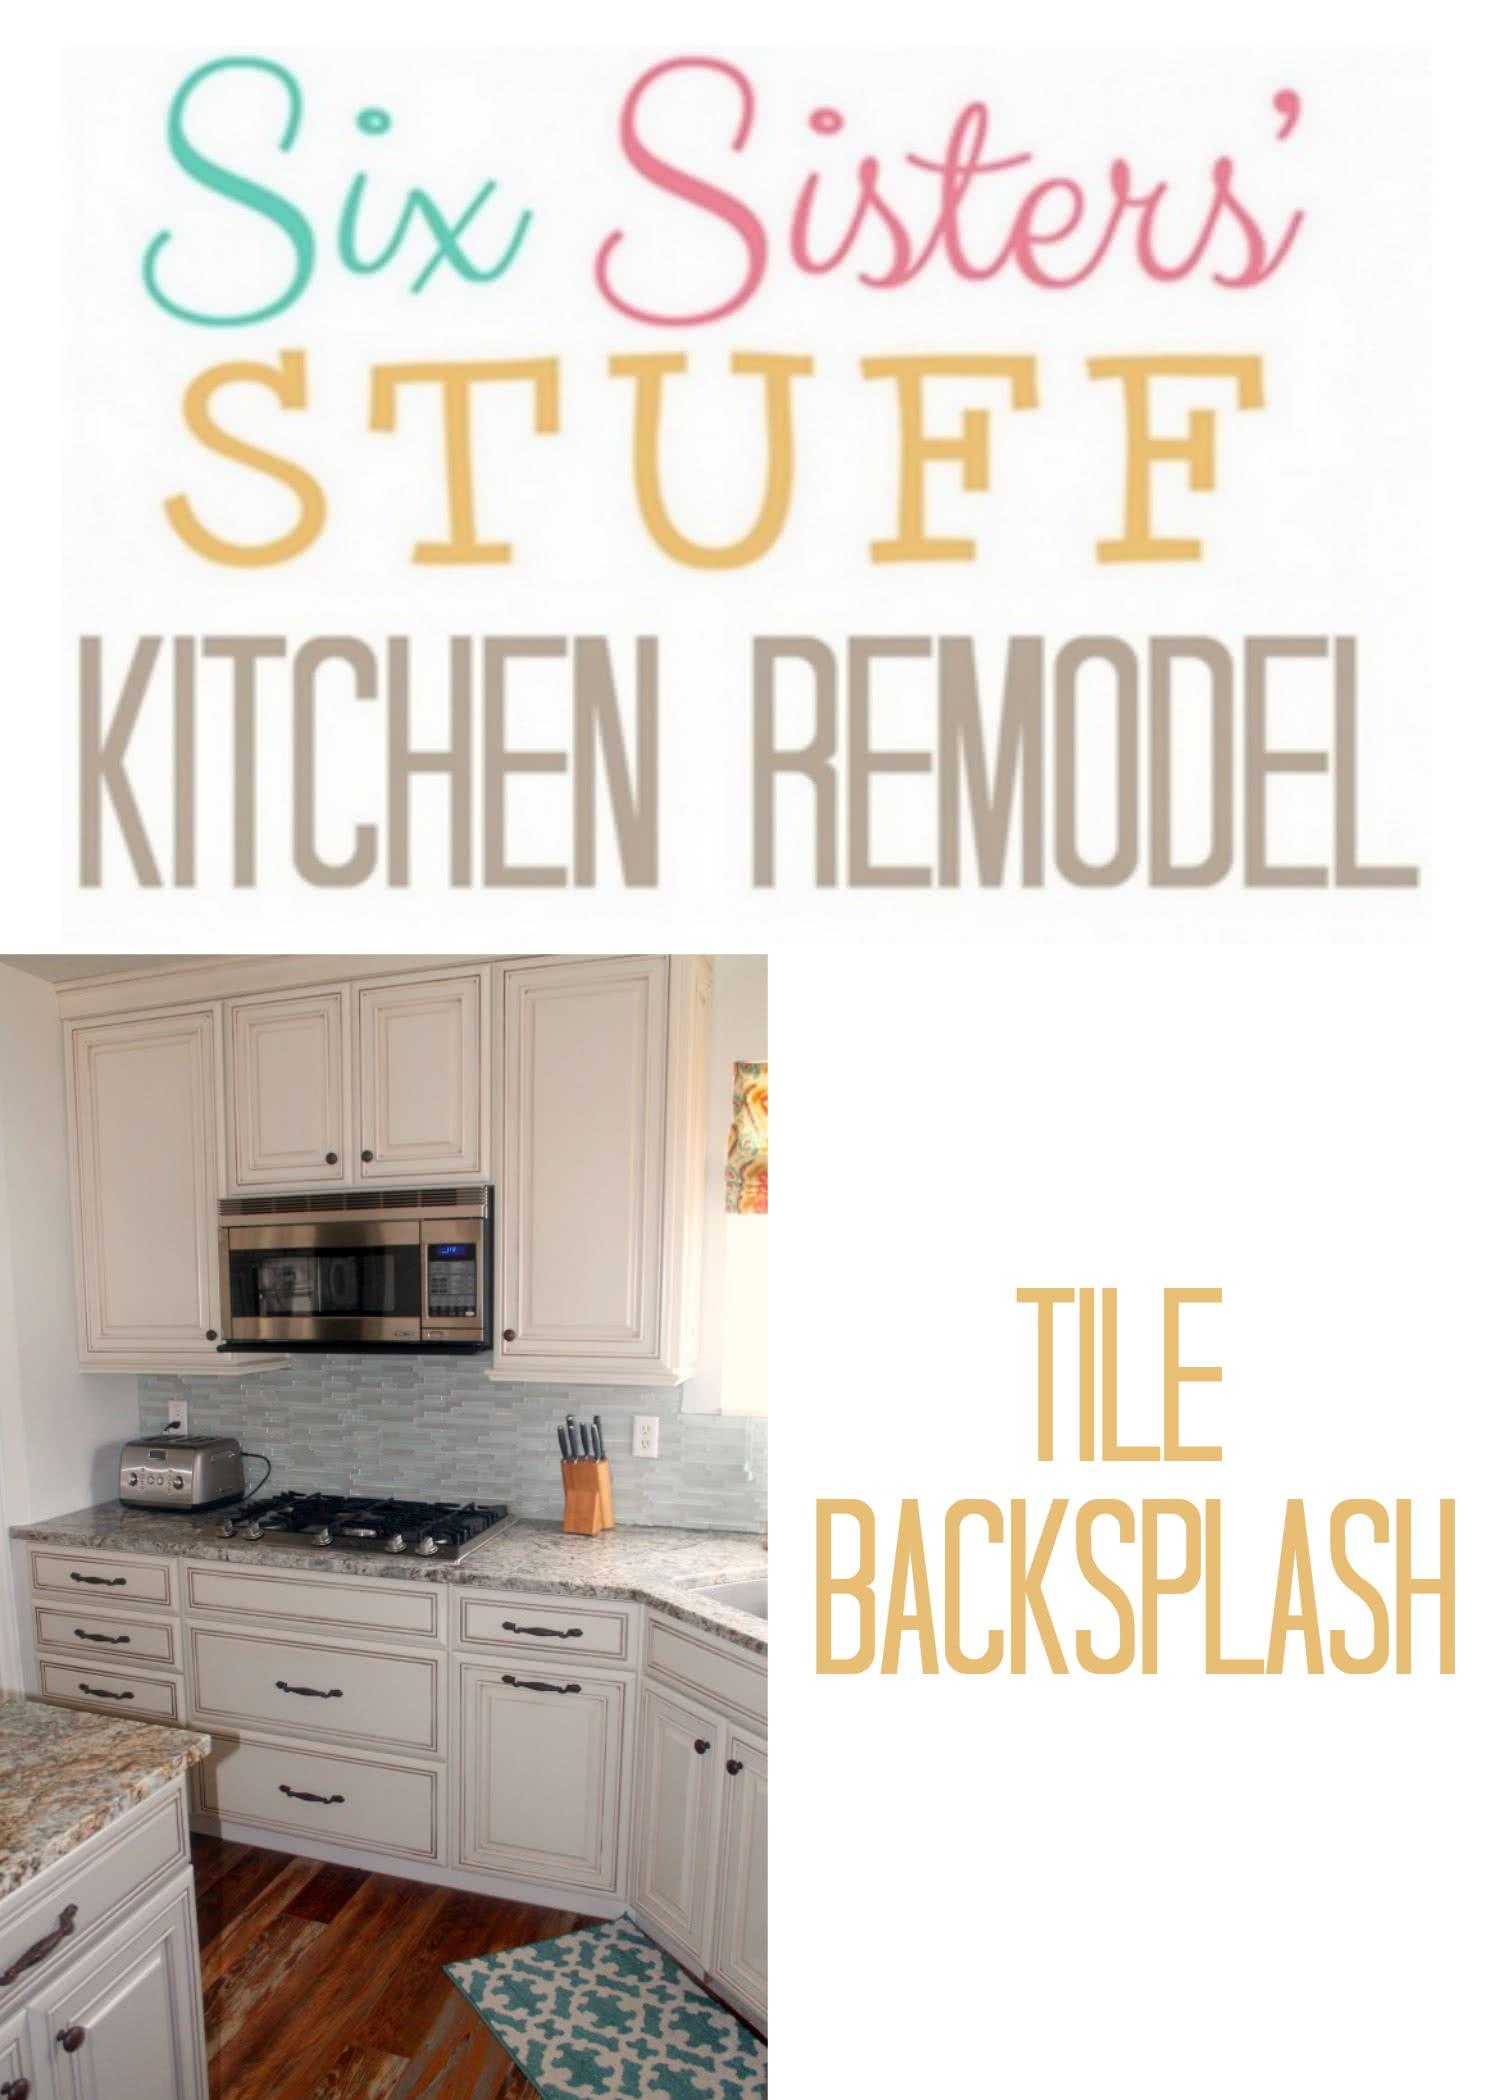 six-sisters-stuff-kitchen-remodel-tile-backsplash.jpg